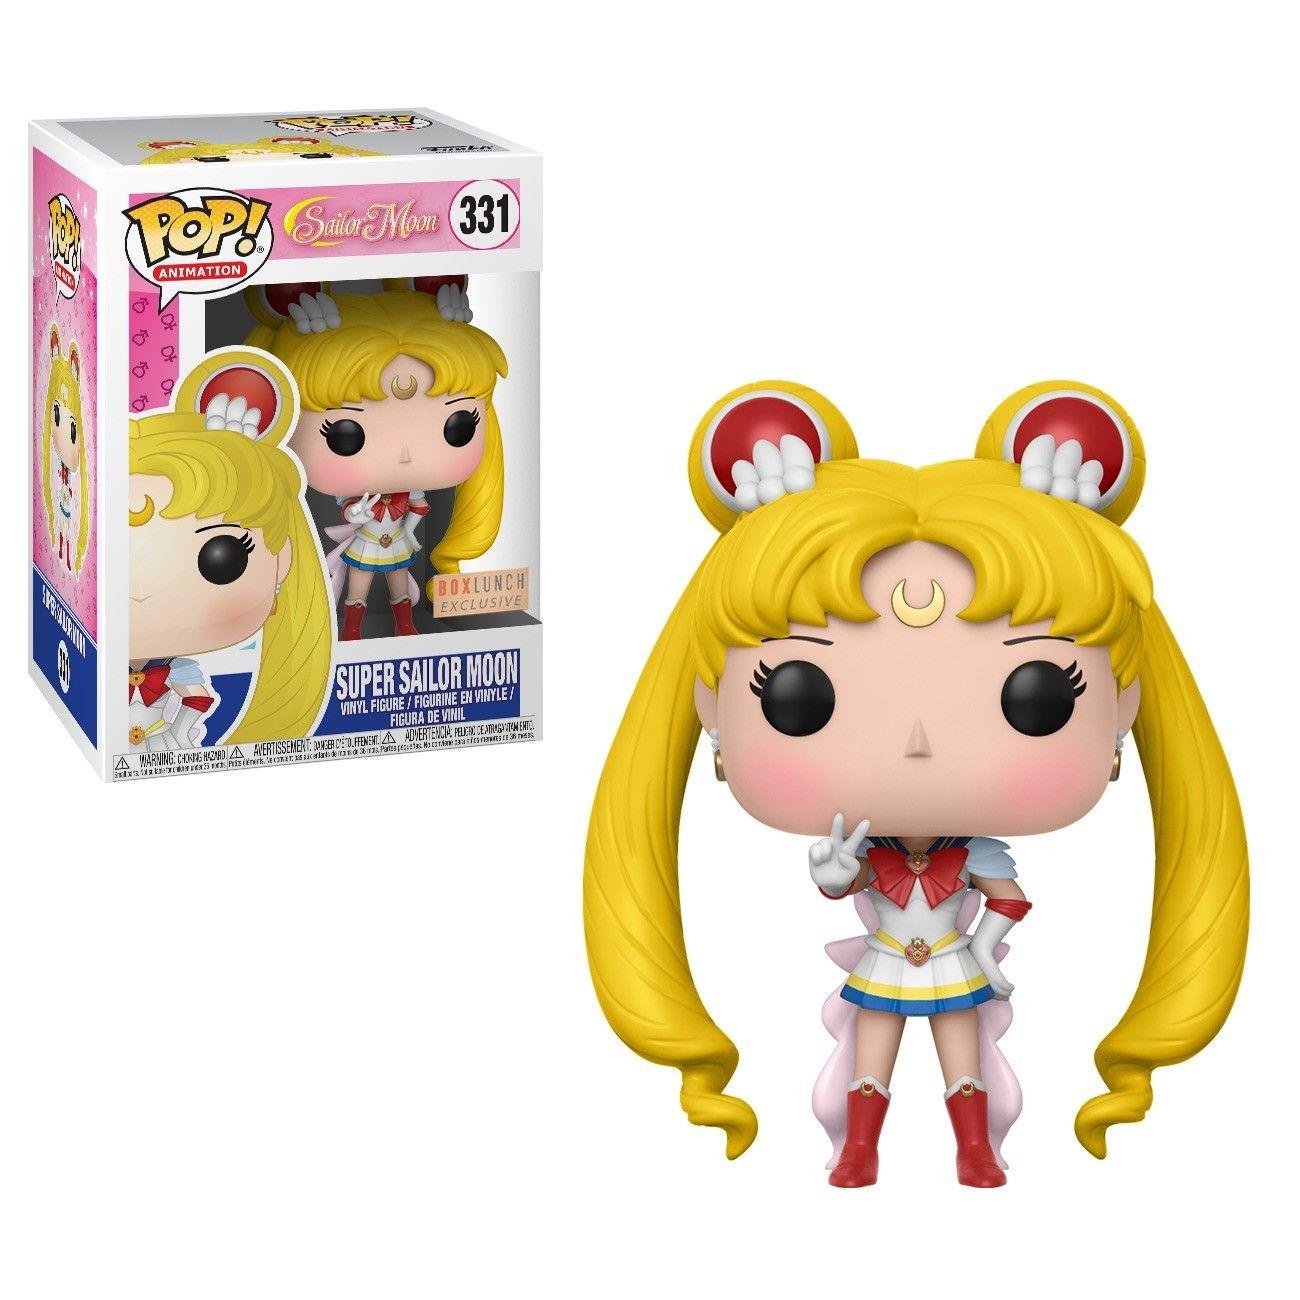 Sailor Moon Super Sailor Moon POP! Animation action